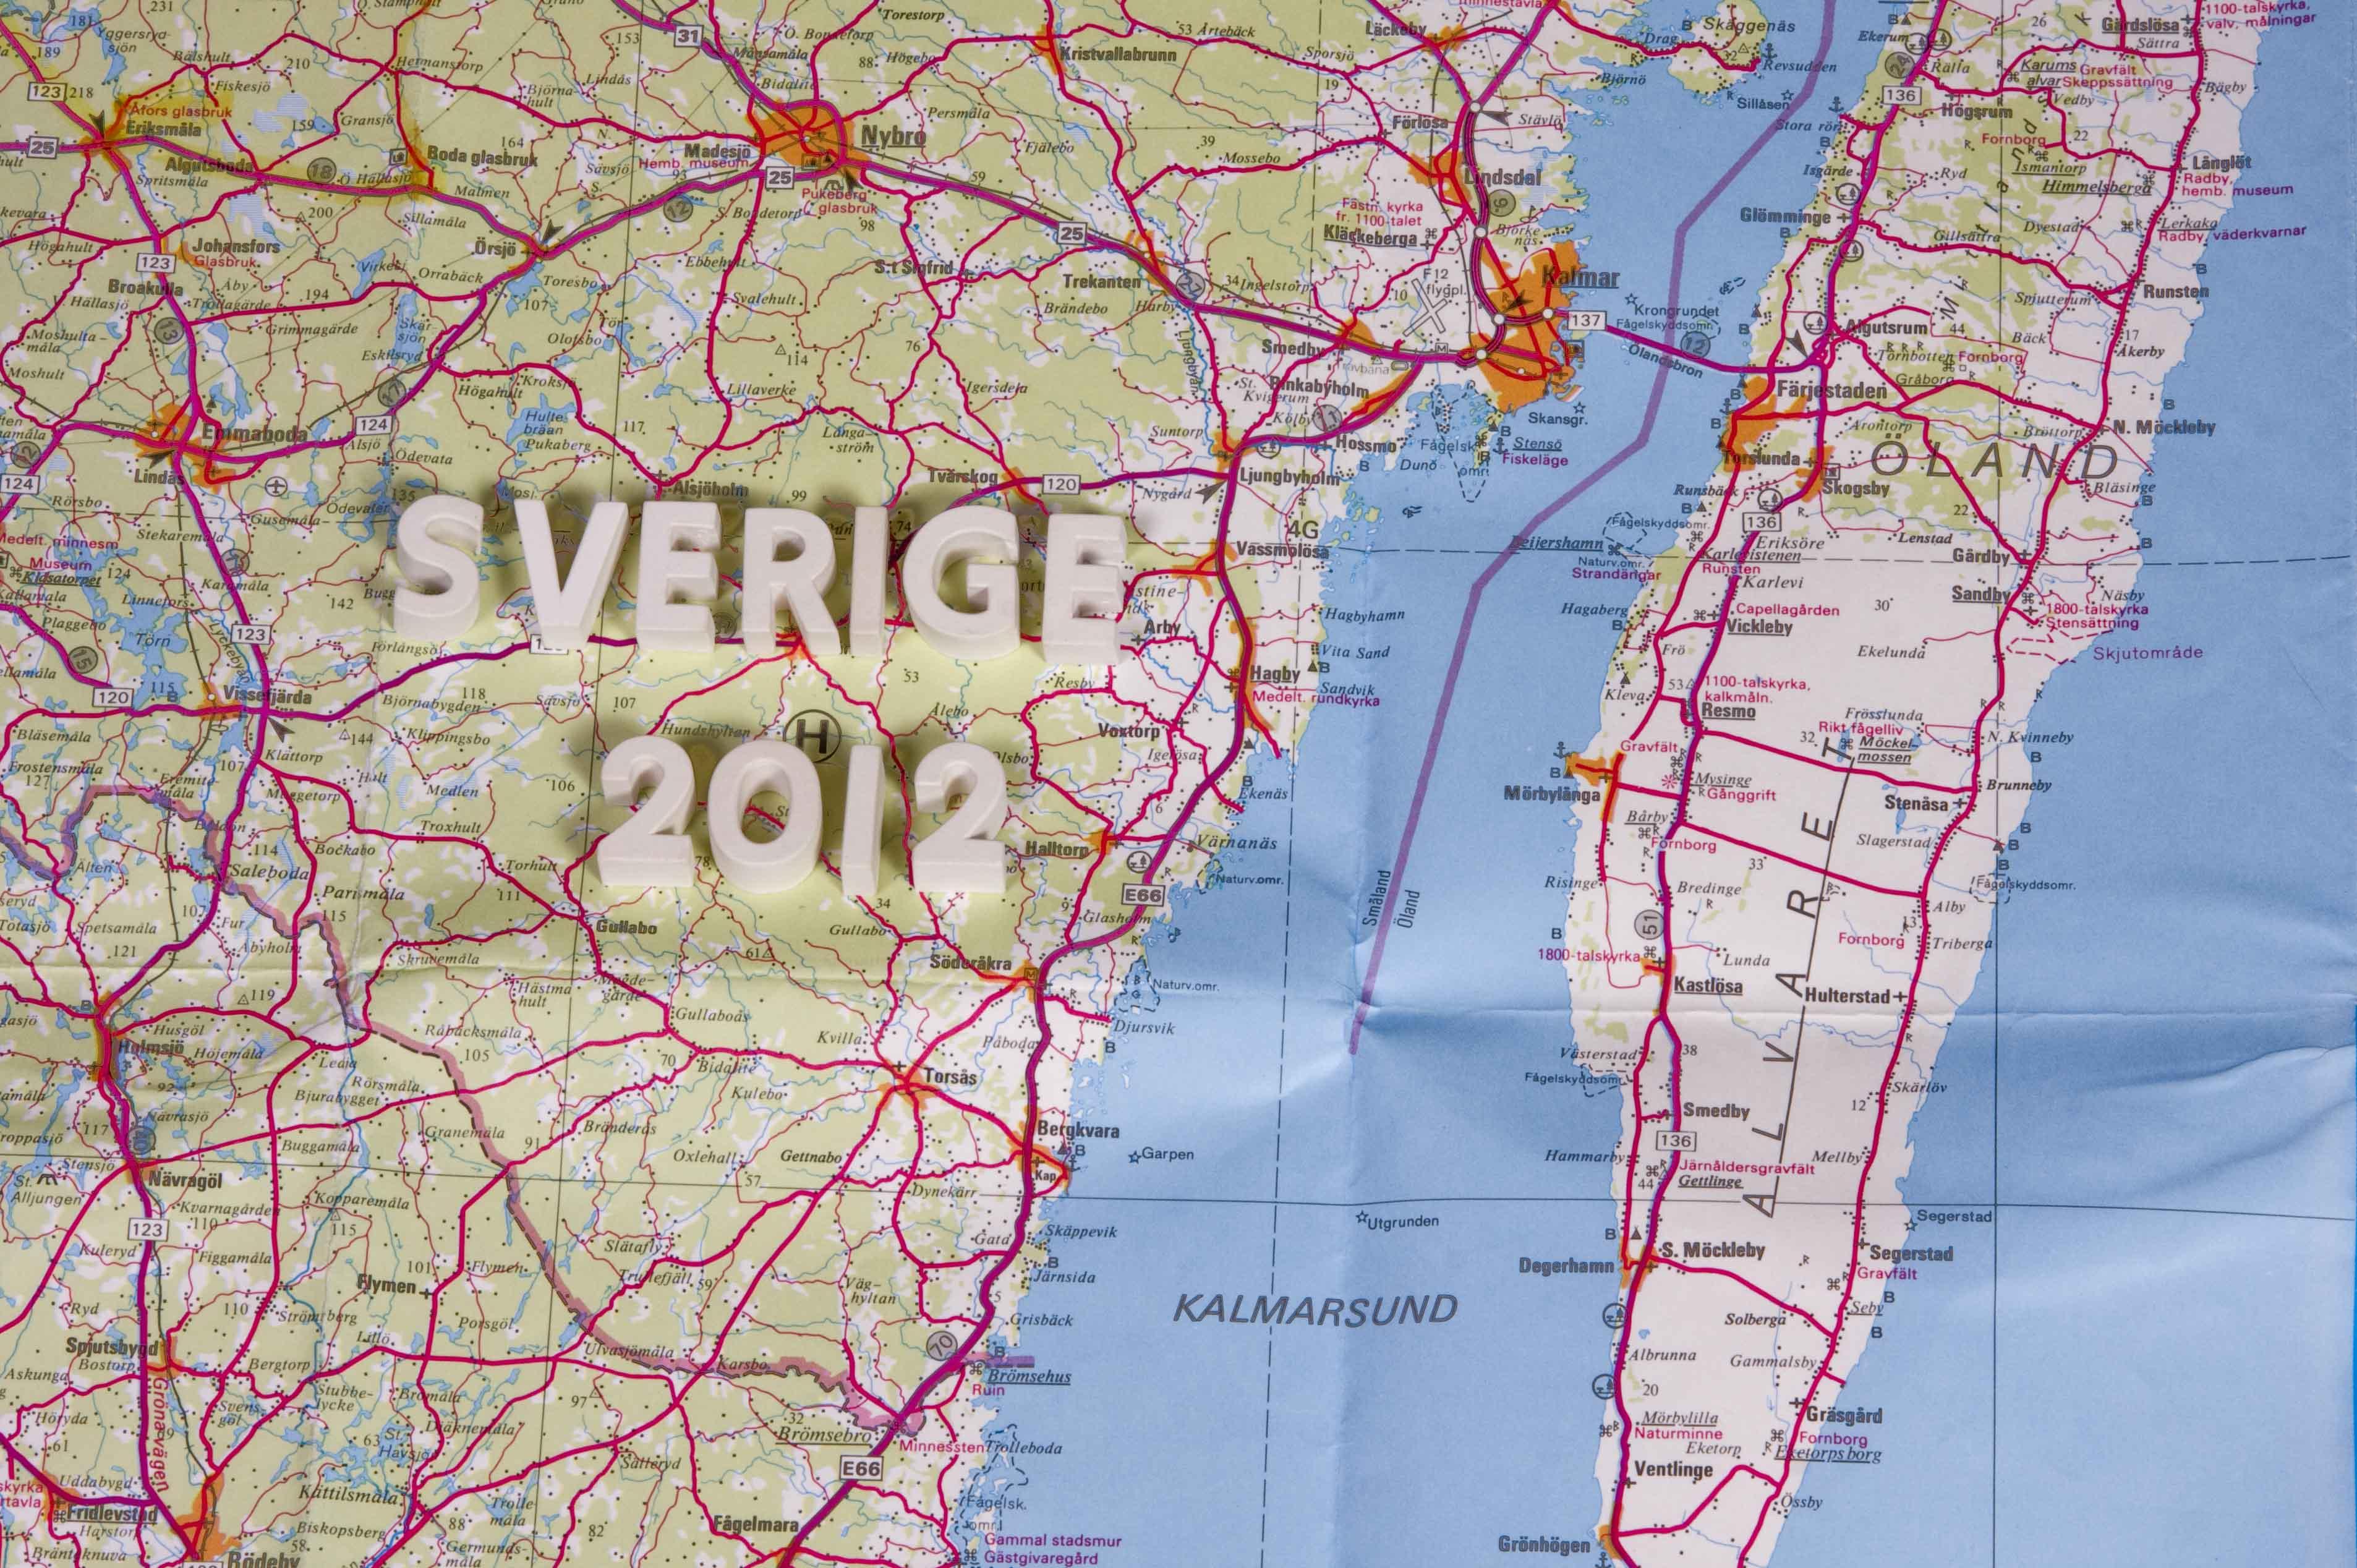 Sverige 2012 ebe75549b3cbc